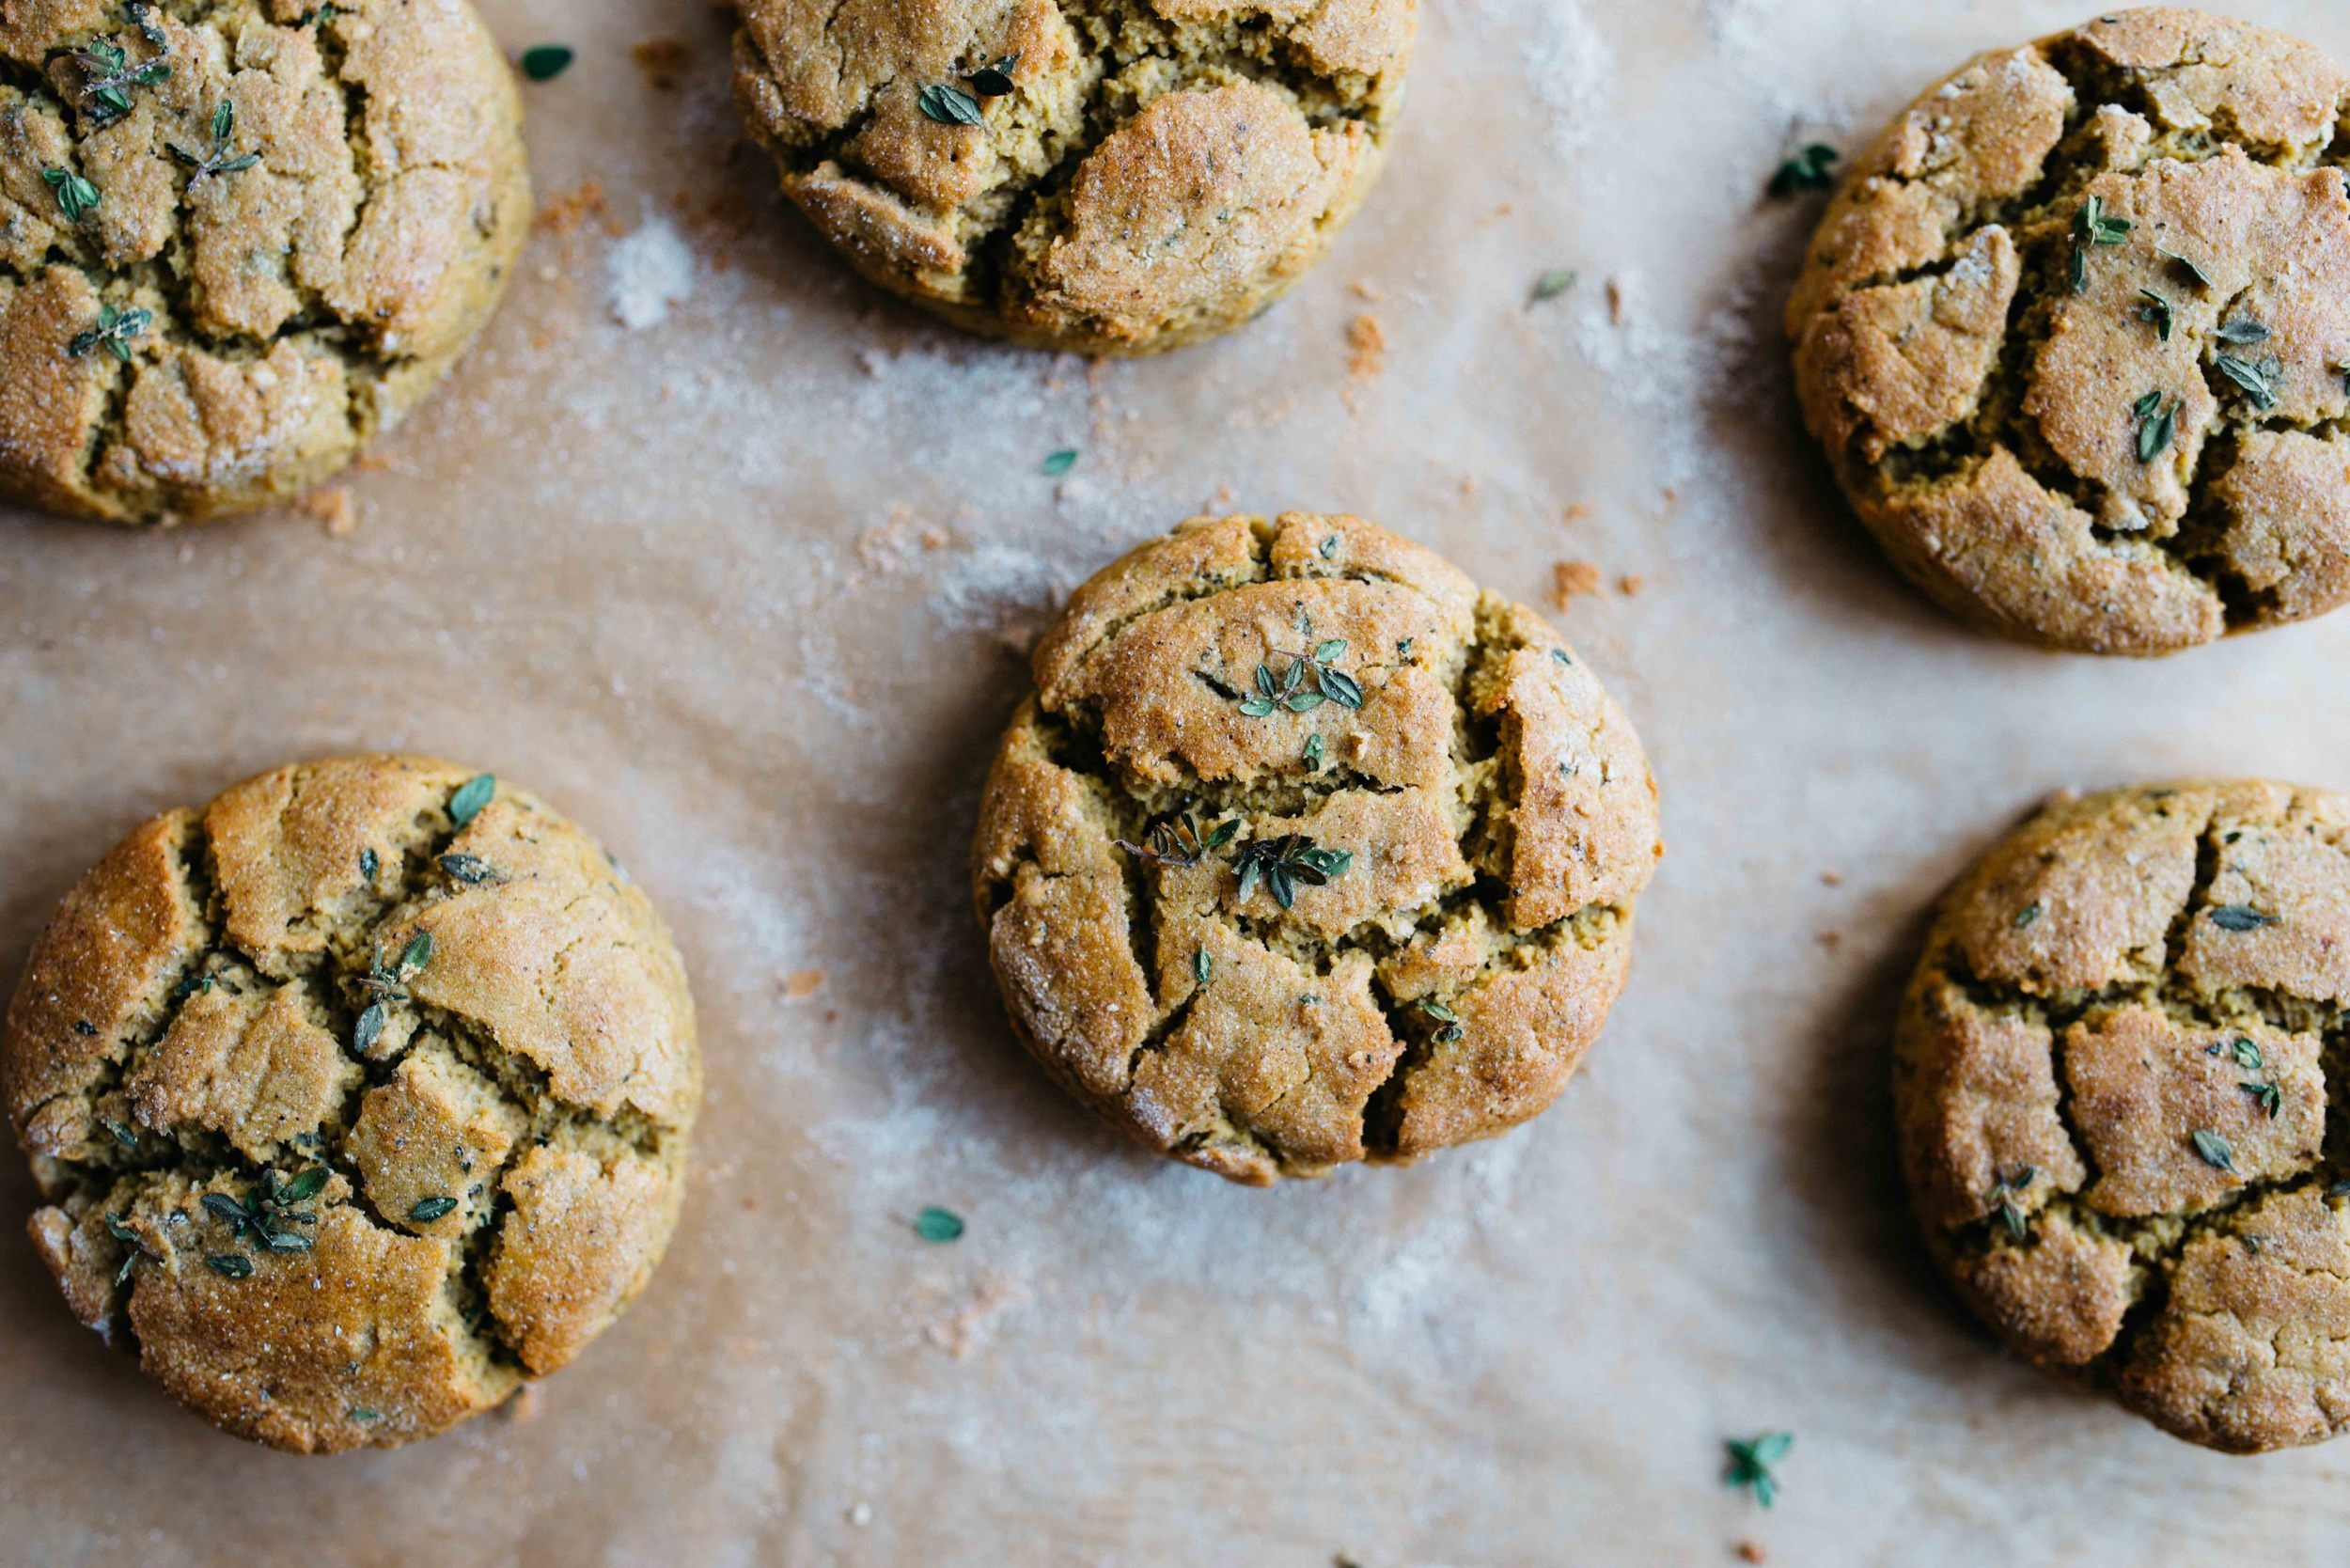 kabocha biscuits (v + gf) | dolly and oatmeal